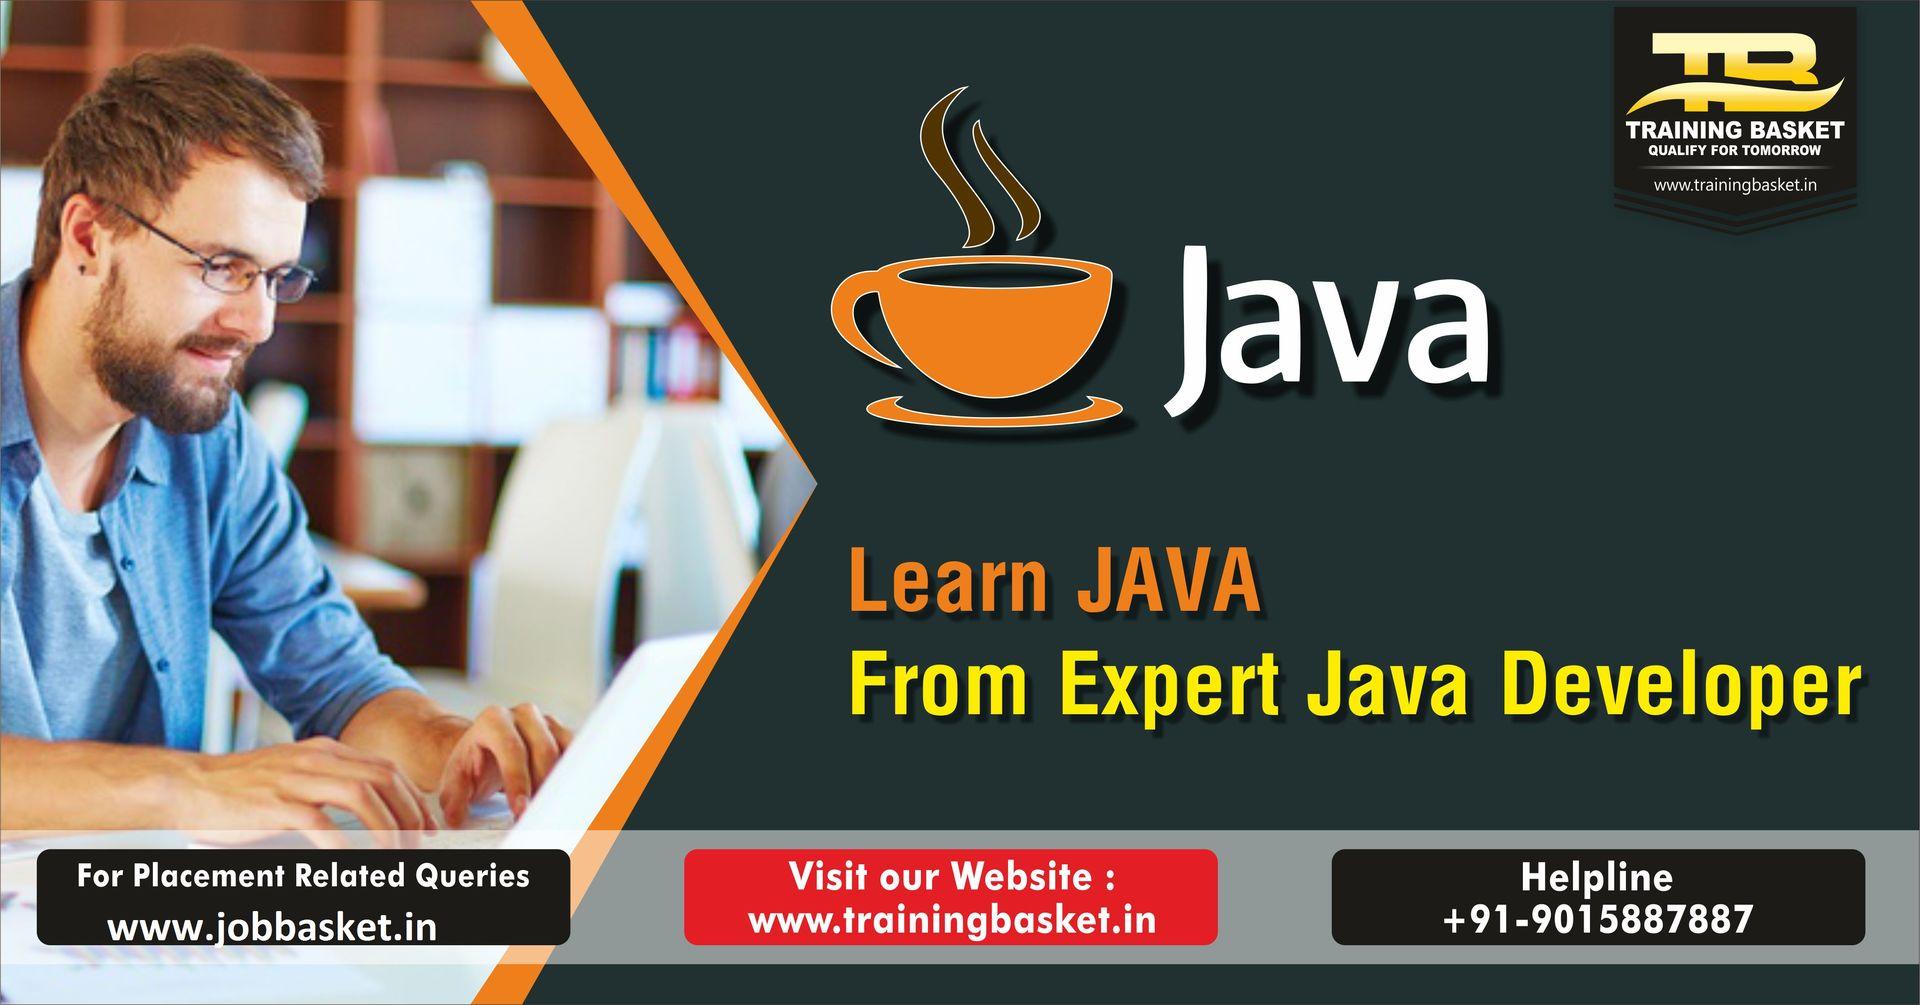 Java Training in Noida   Java Training Institute in Noida   Training Basket 2018   Pearltrees